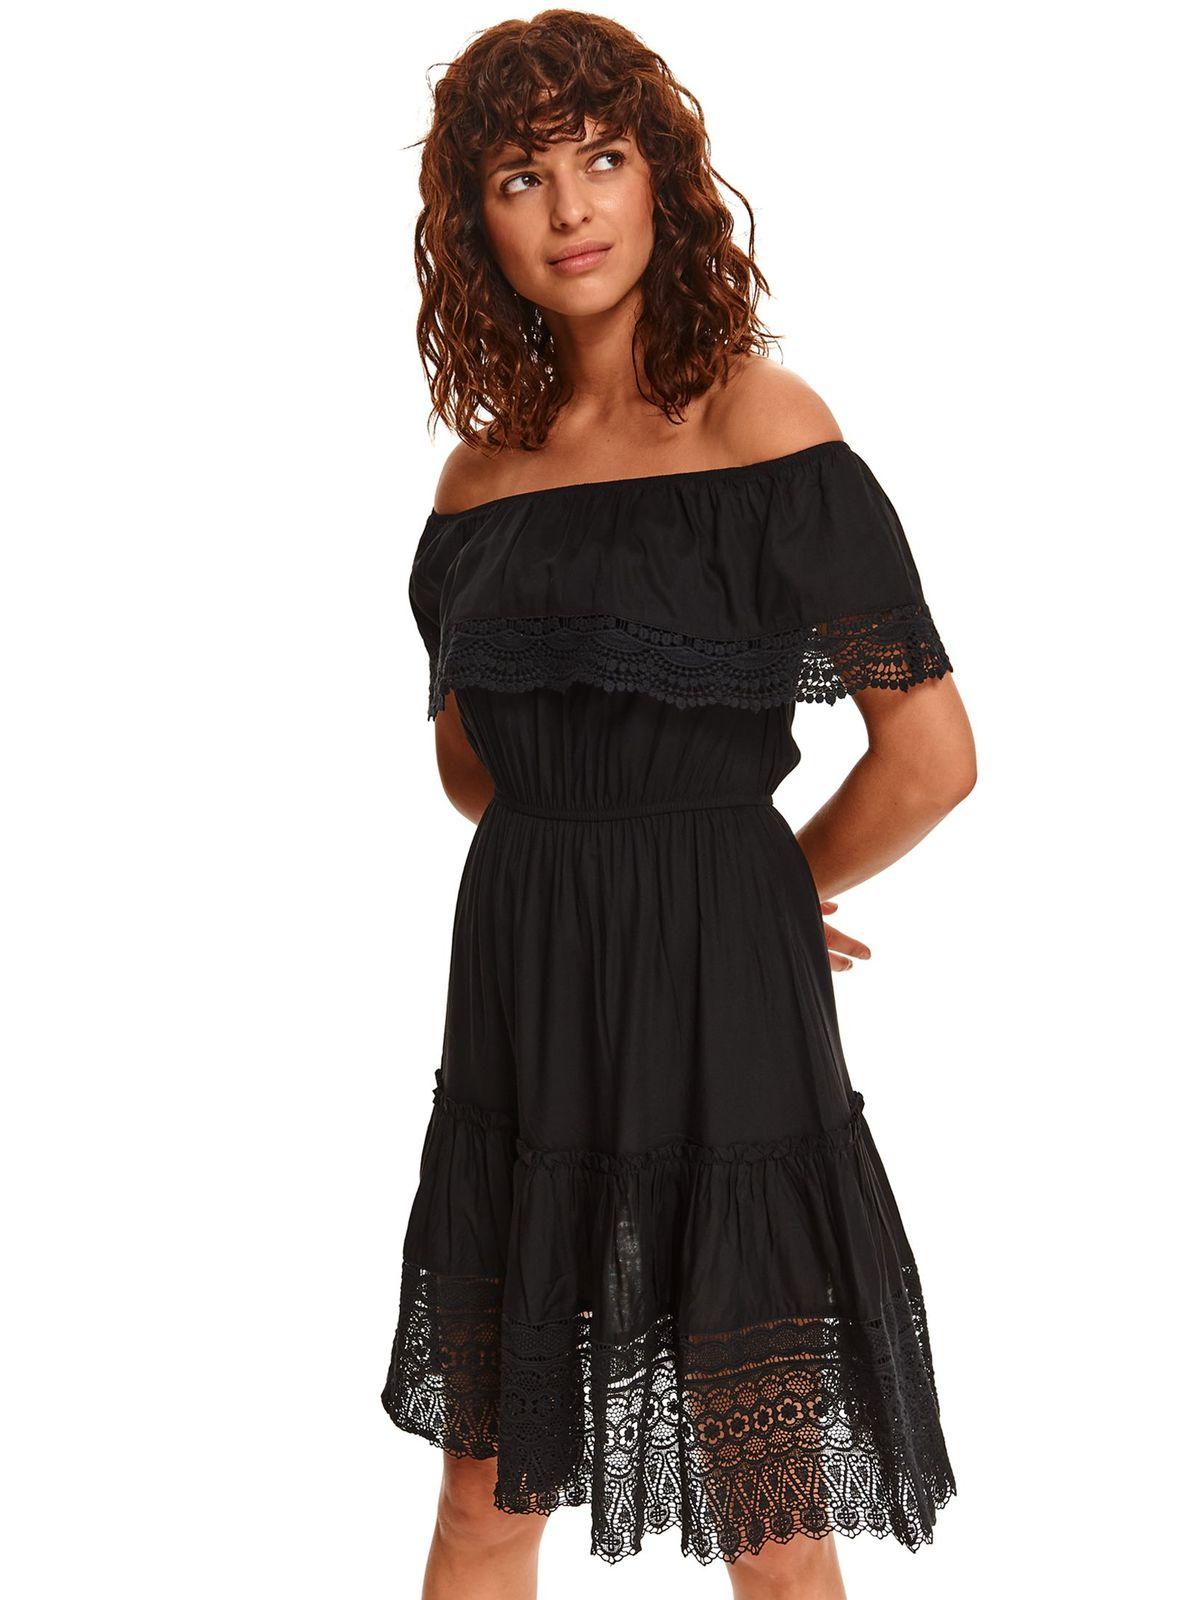 Black dress midi naked shoulders cloche with elastic waist